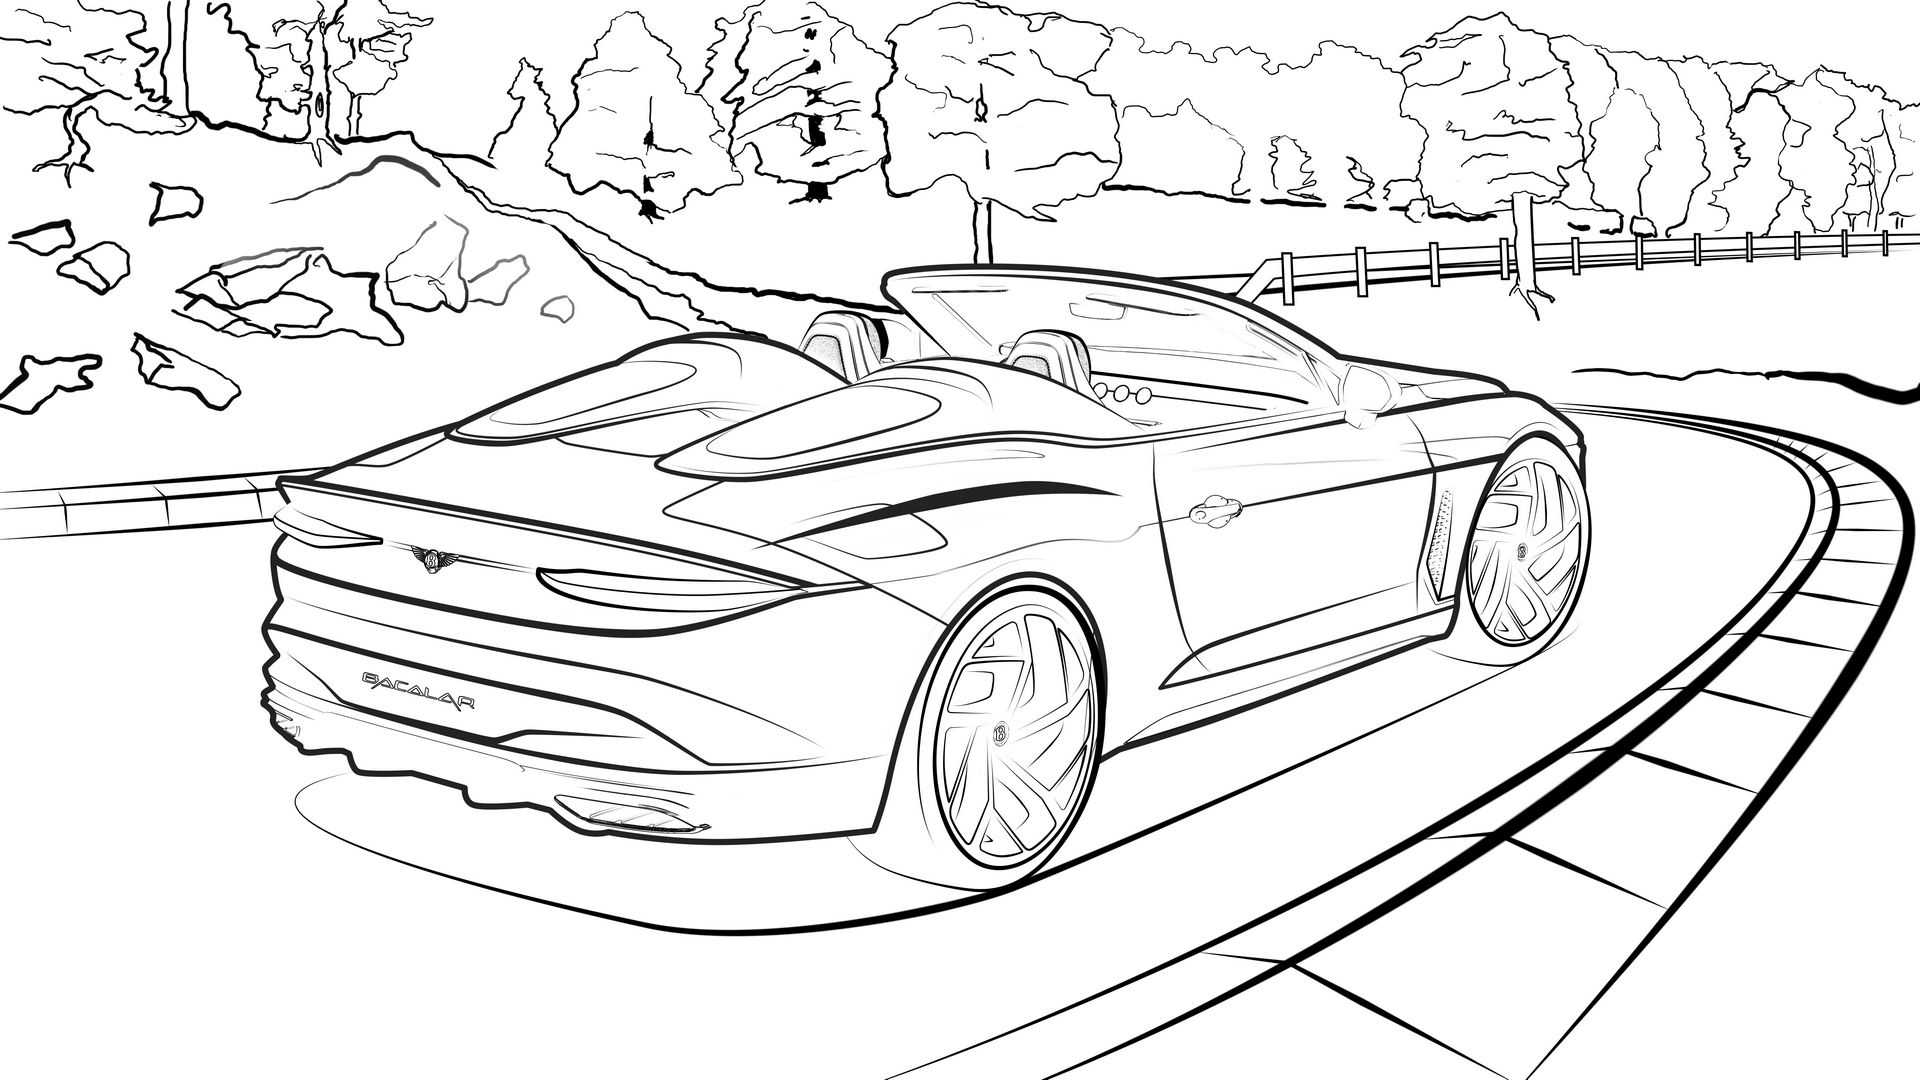 Line-Drawing-Bacalar-Exterior